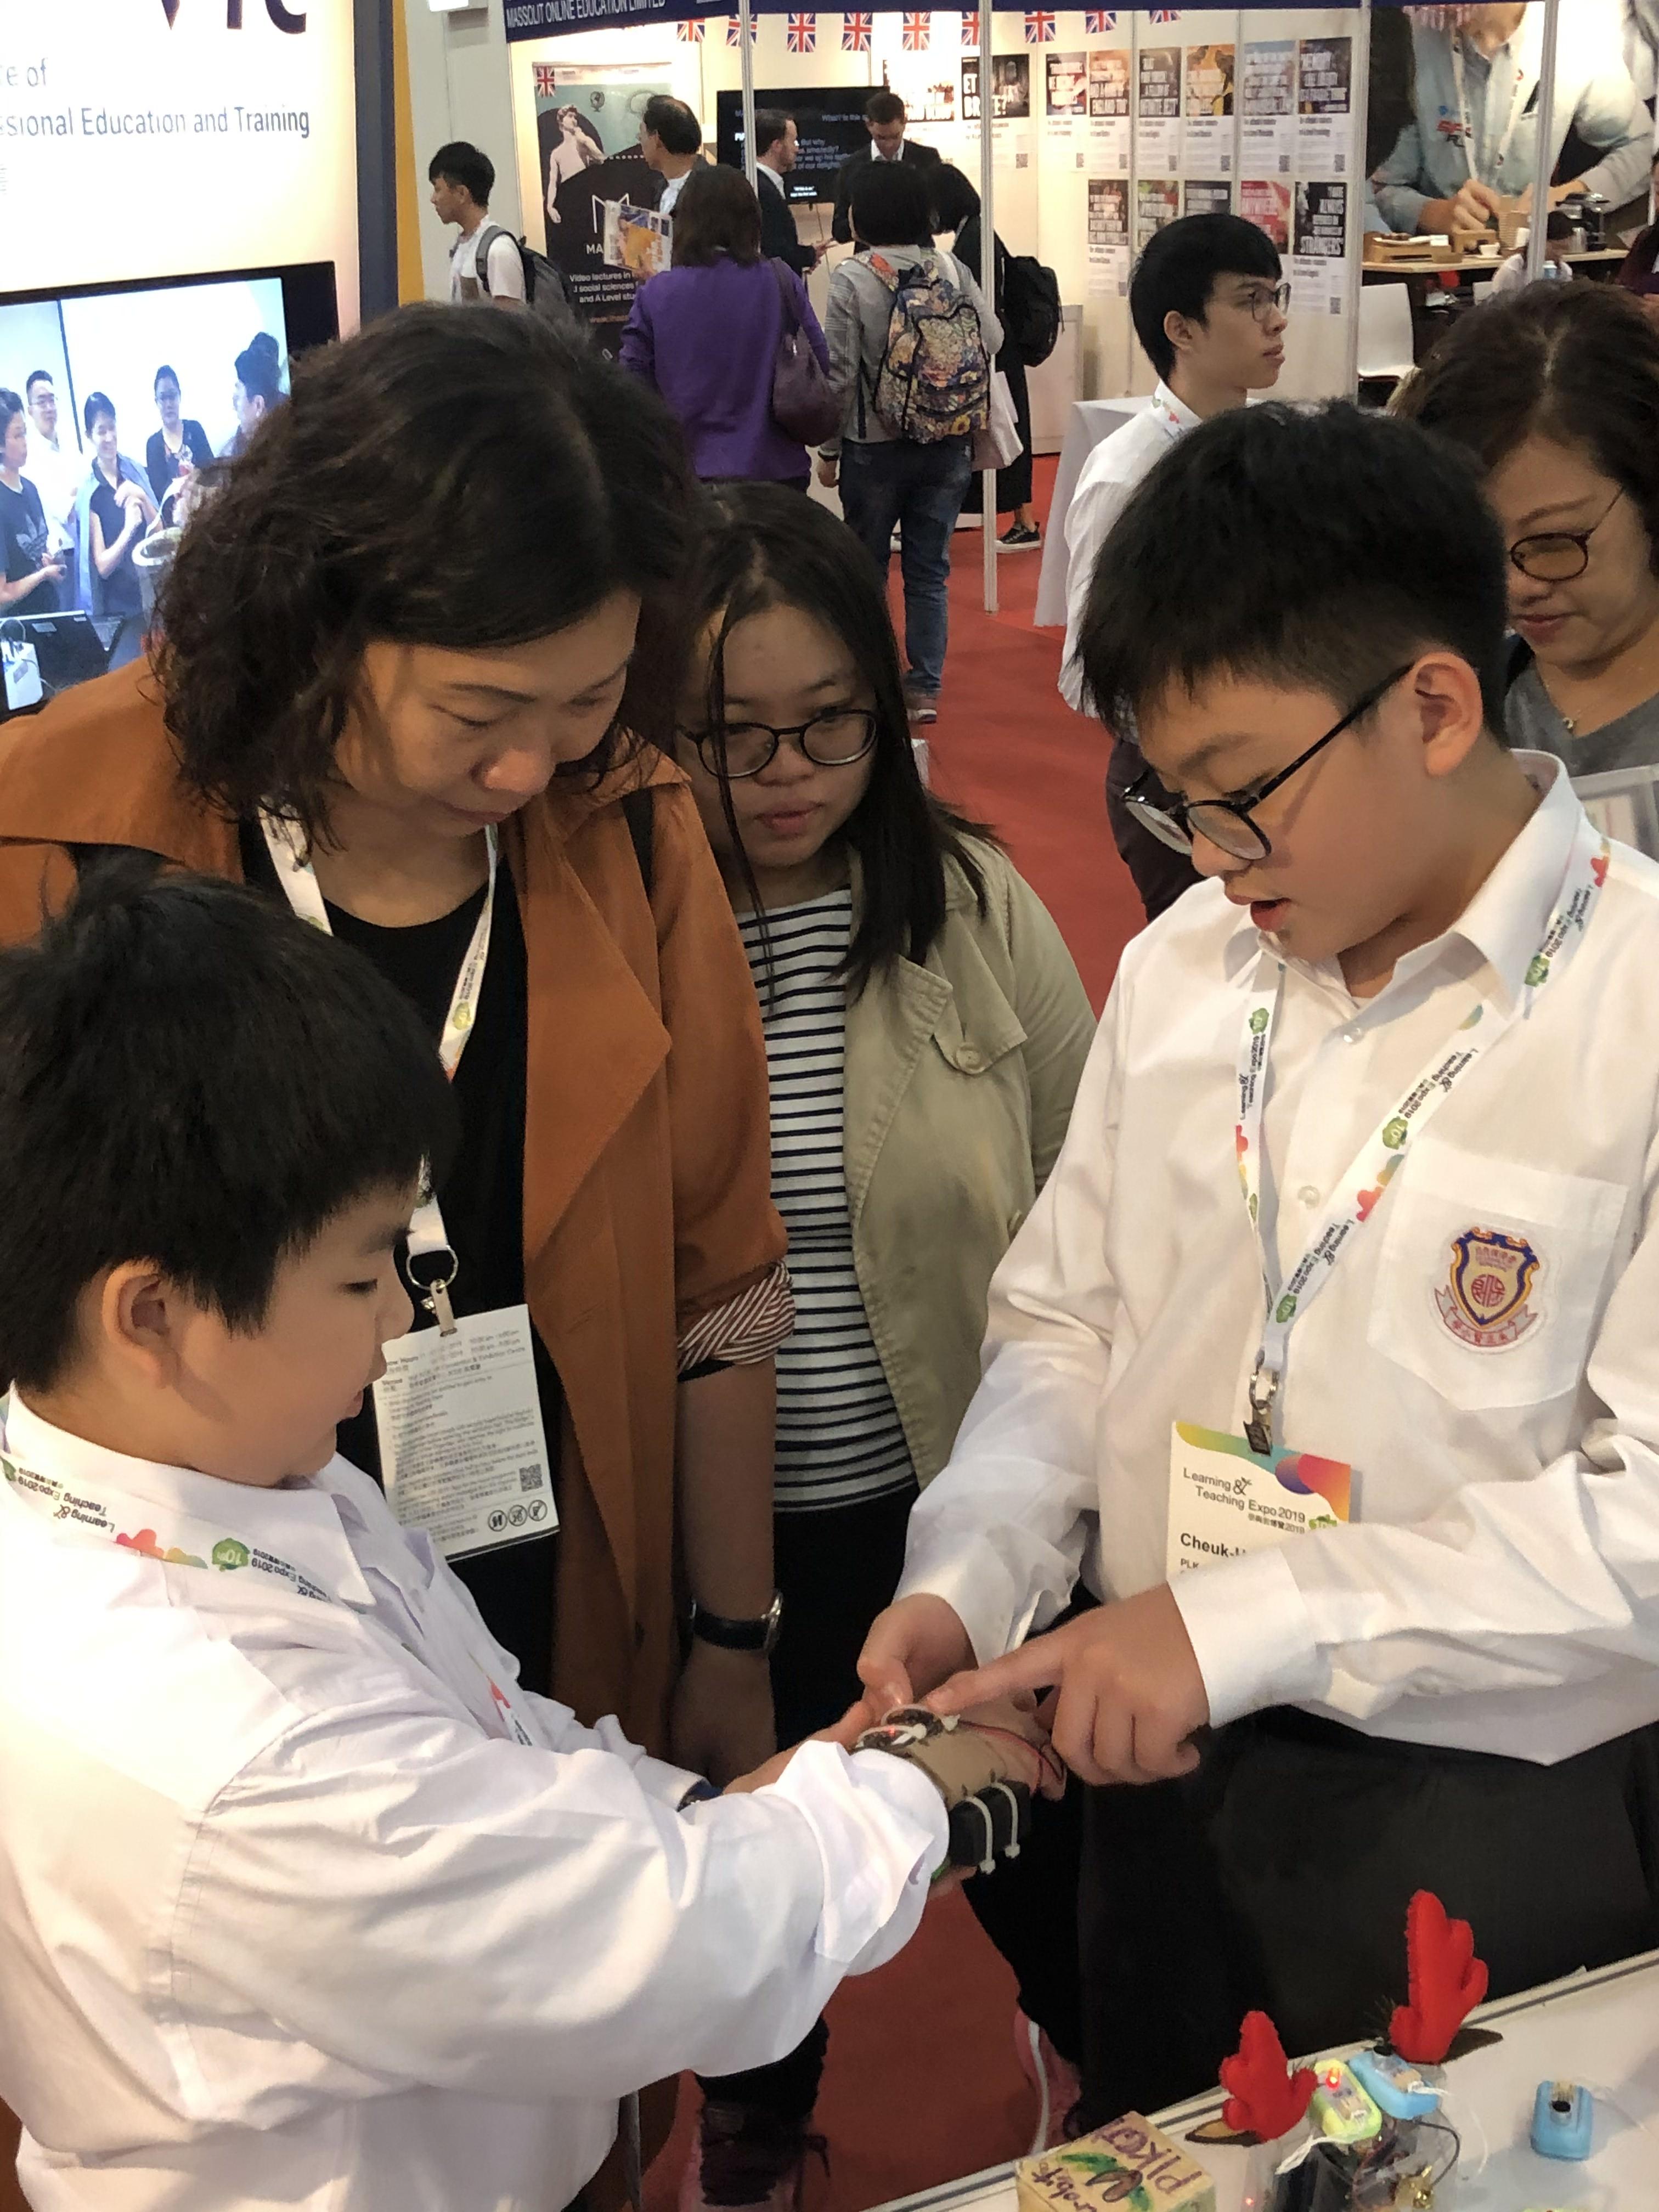 https://plkcjy.edu.hk/sites/default/files/xuan_zhuan_img_6080.jpg